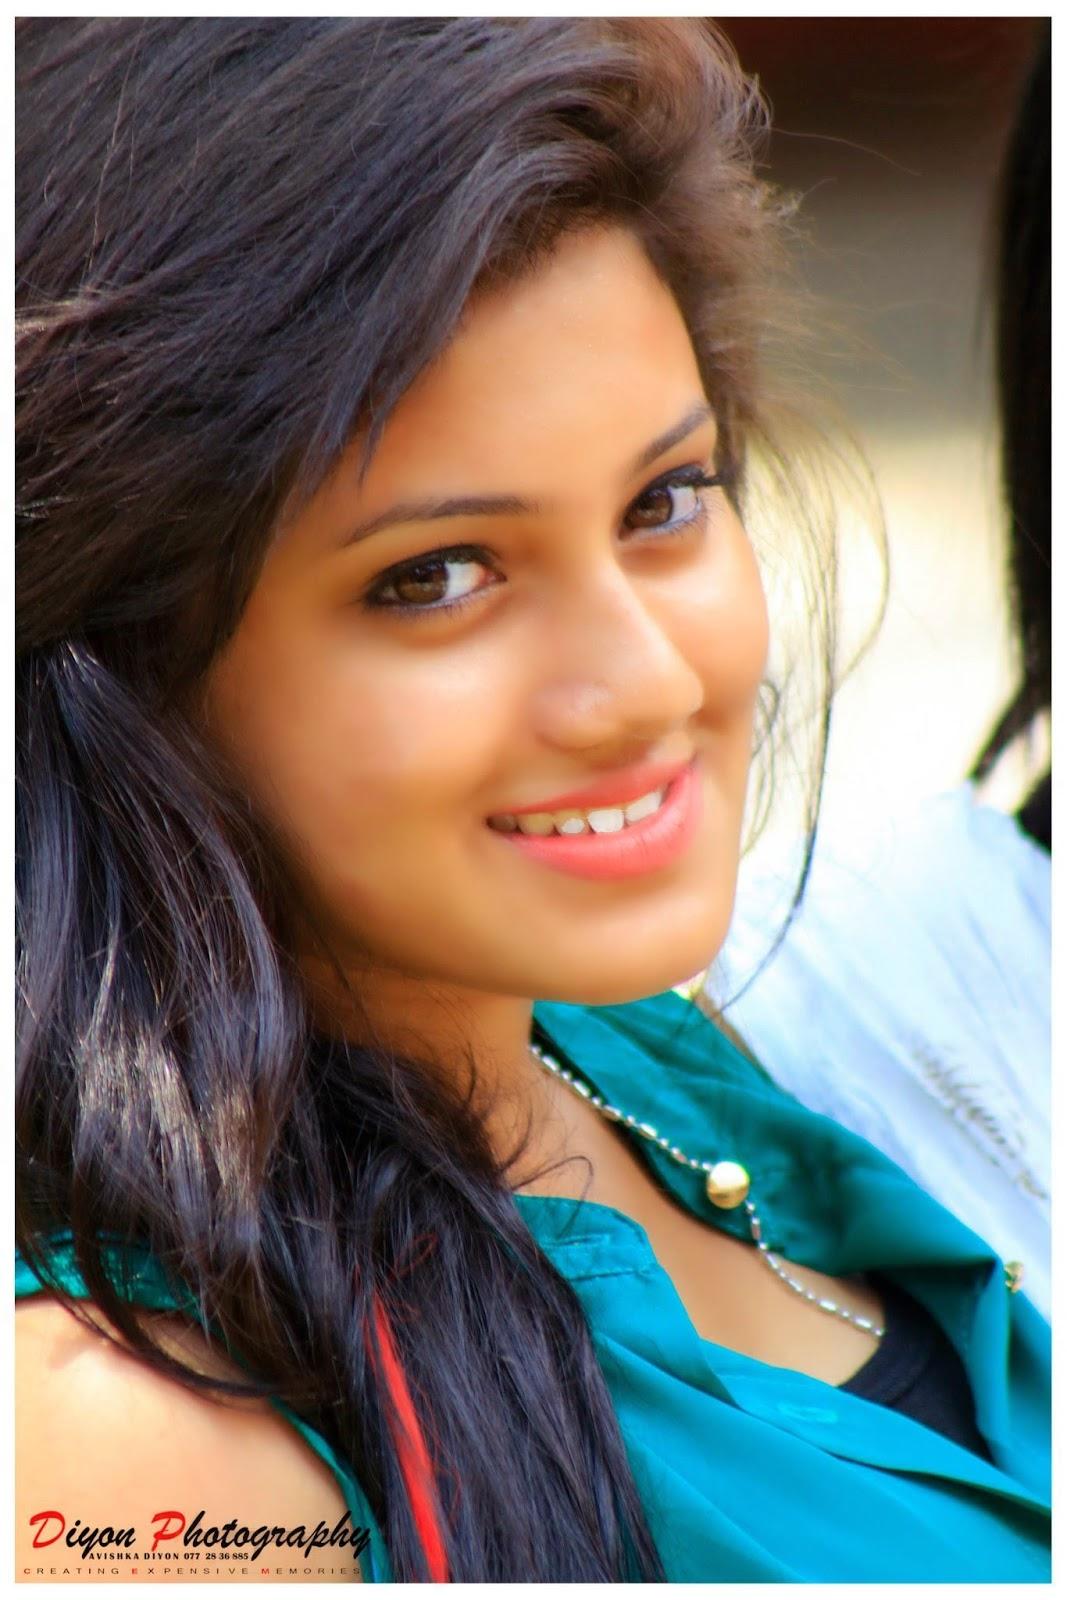 Rekha Samanmali | Sri Lankan Actress And Models: Rekha